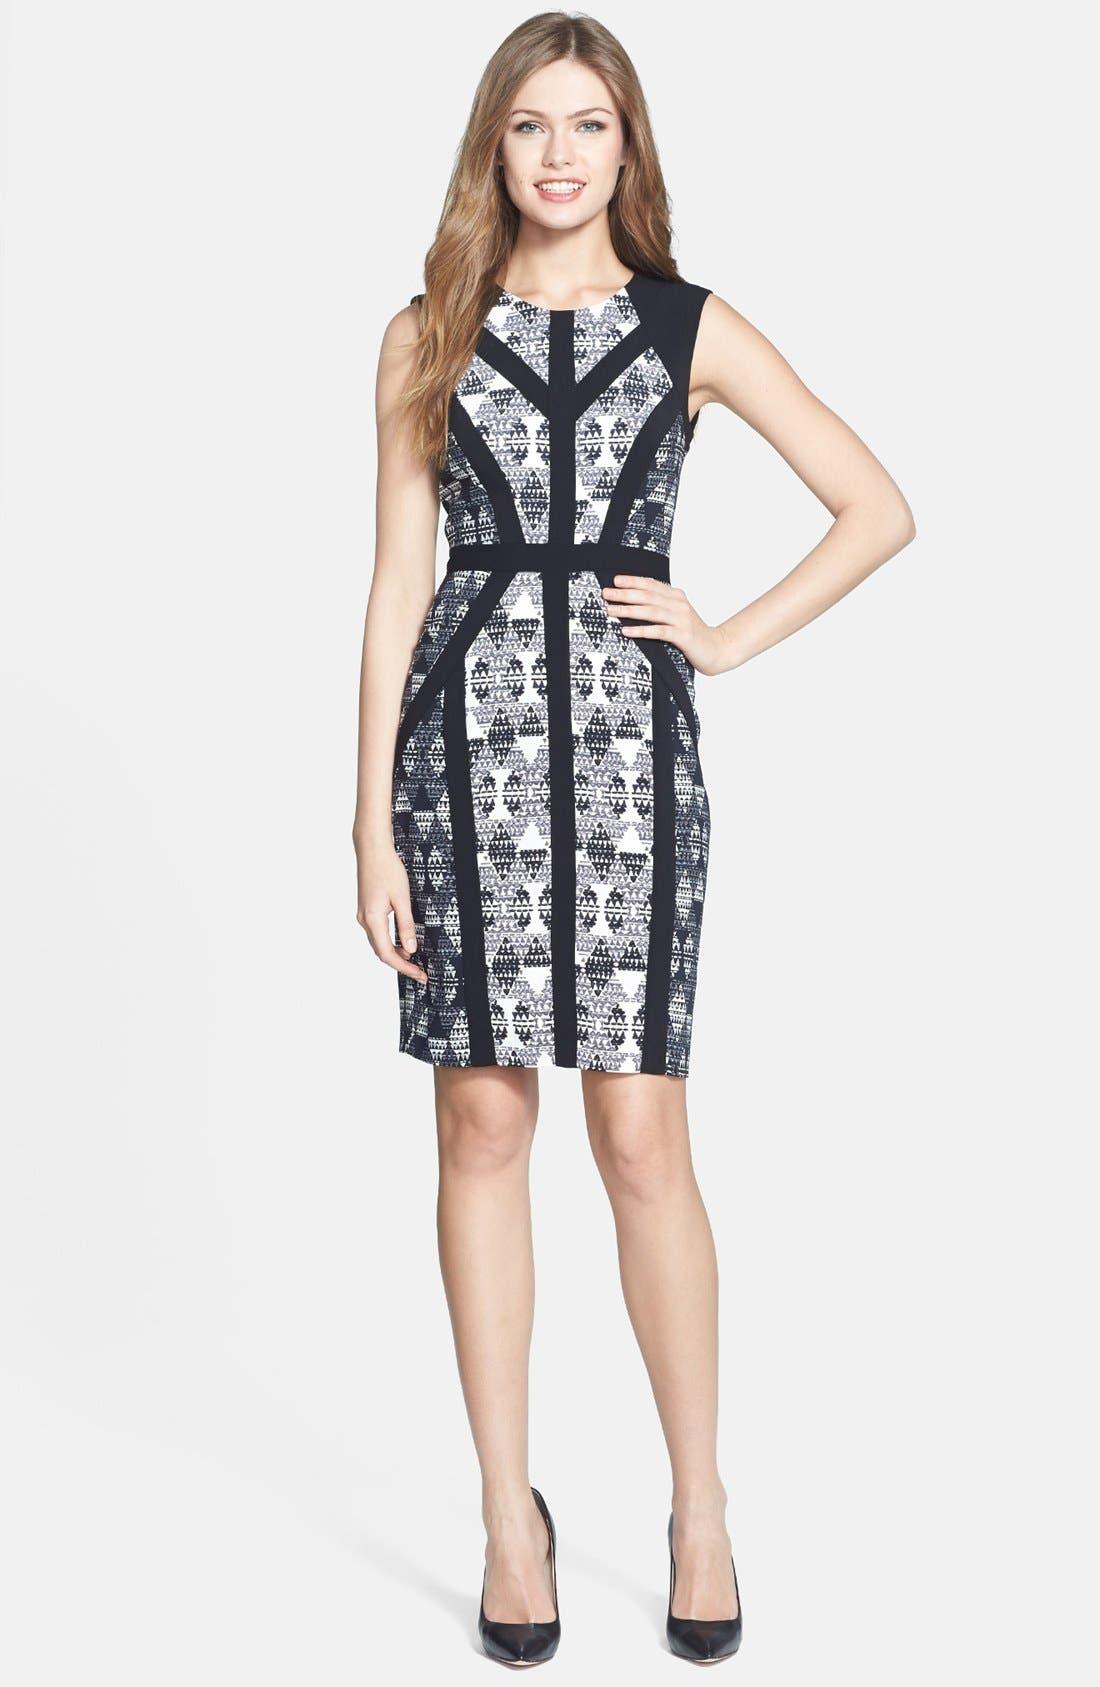 Alternate Image 1 Selected - BCBGMAXAZRIA 'Holly' Print Stretch Crepe Sheath Dress